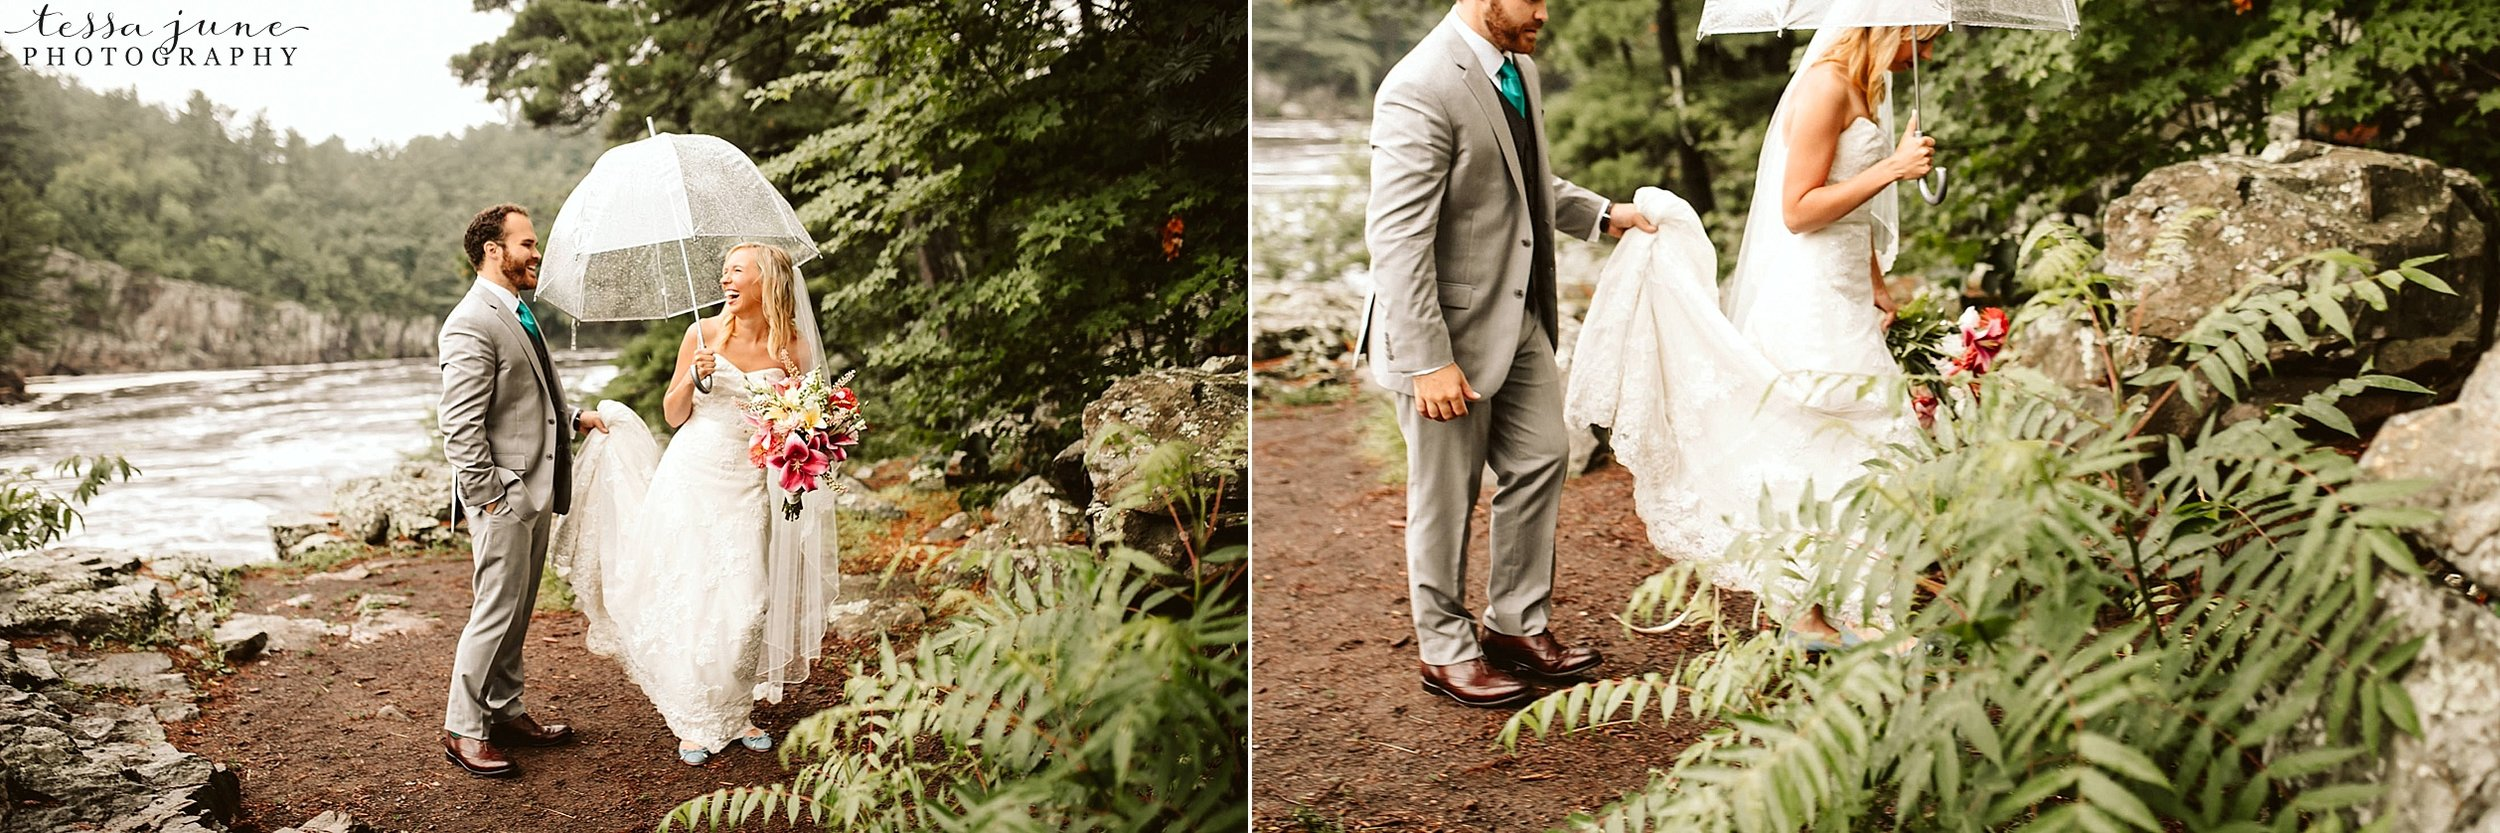 taylors-falls-rainy-elopement-wedding-interstate-state-park-15.jpg